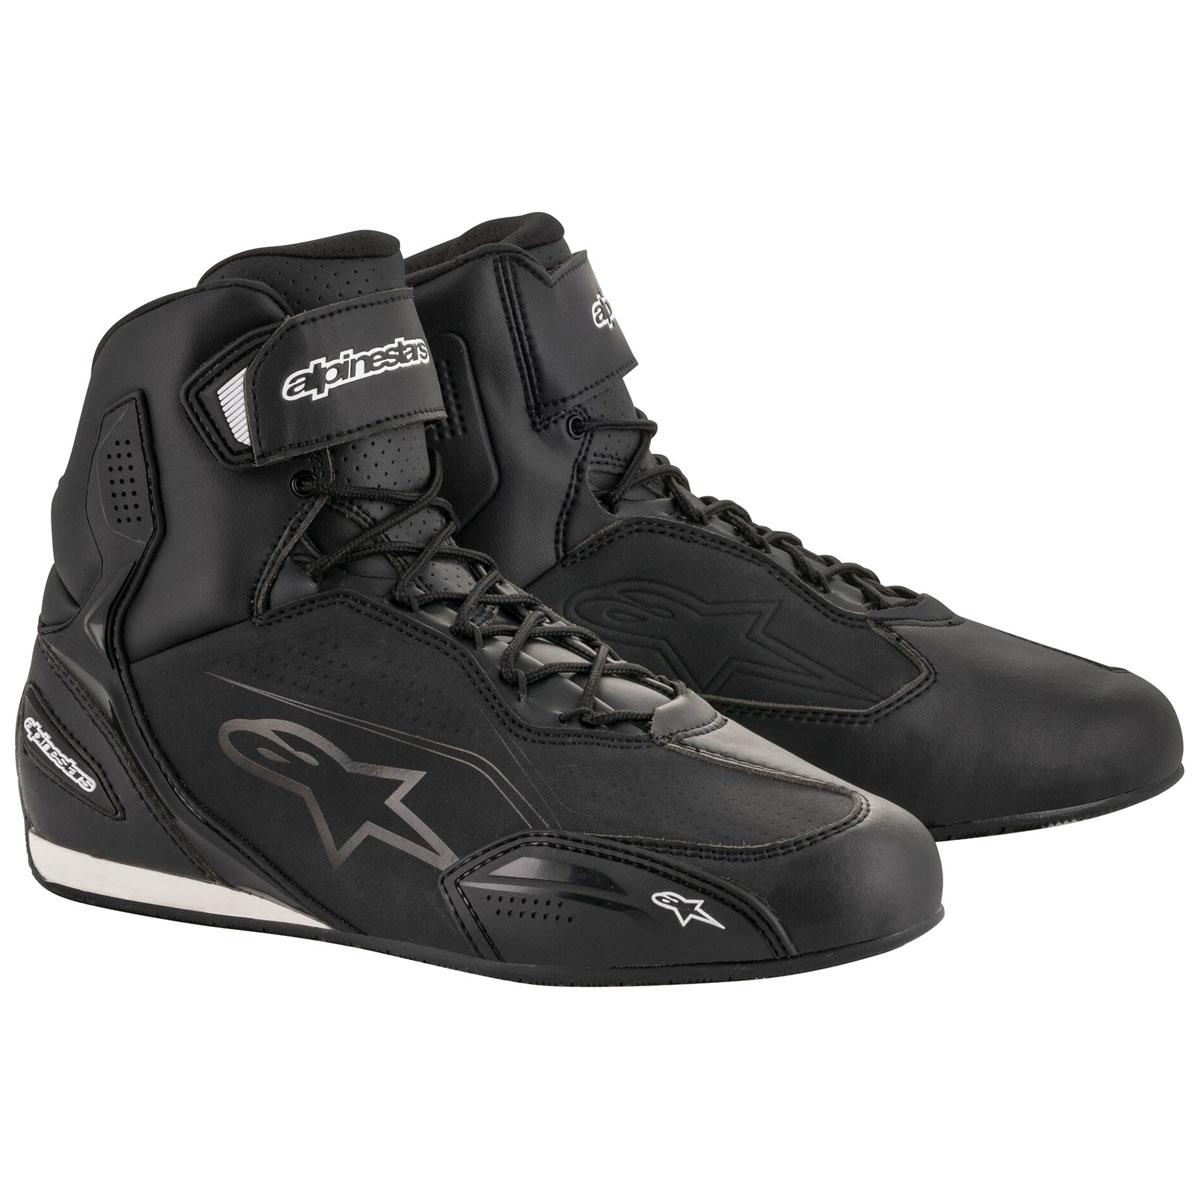 Alpinestars Men's Faster-3 Black/Black Boots